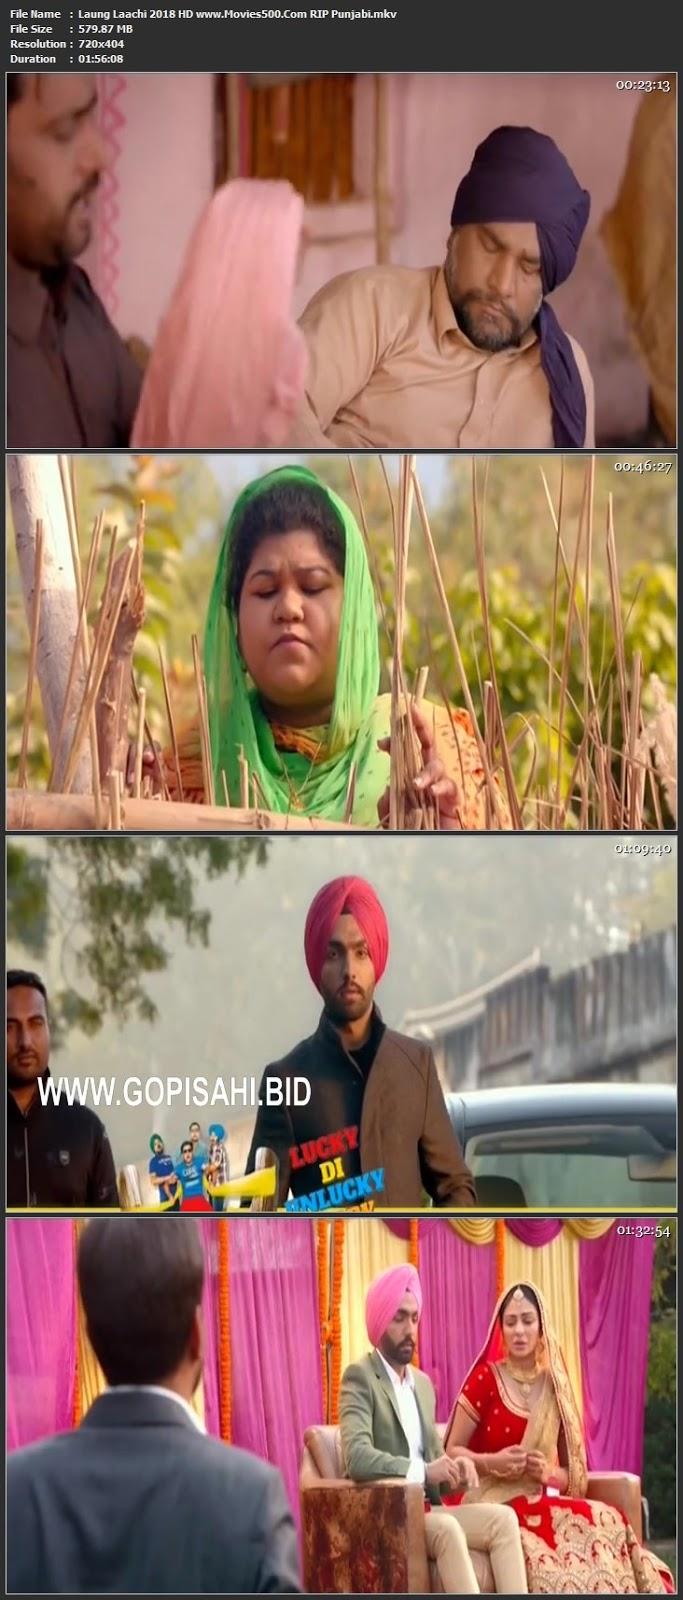 Laung Laachi 2018 Punjabi Full Movie HDTV 720p at movies500.info